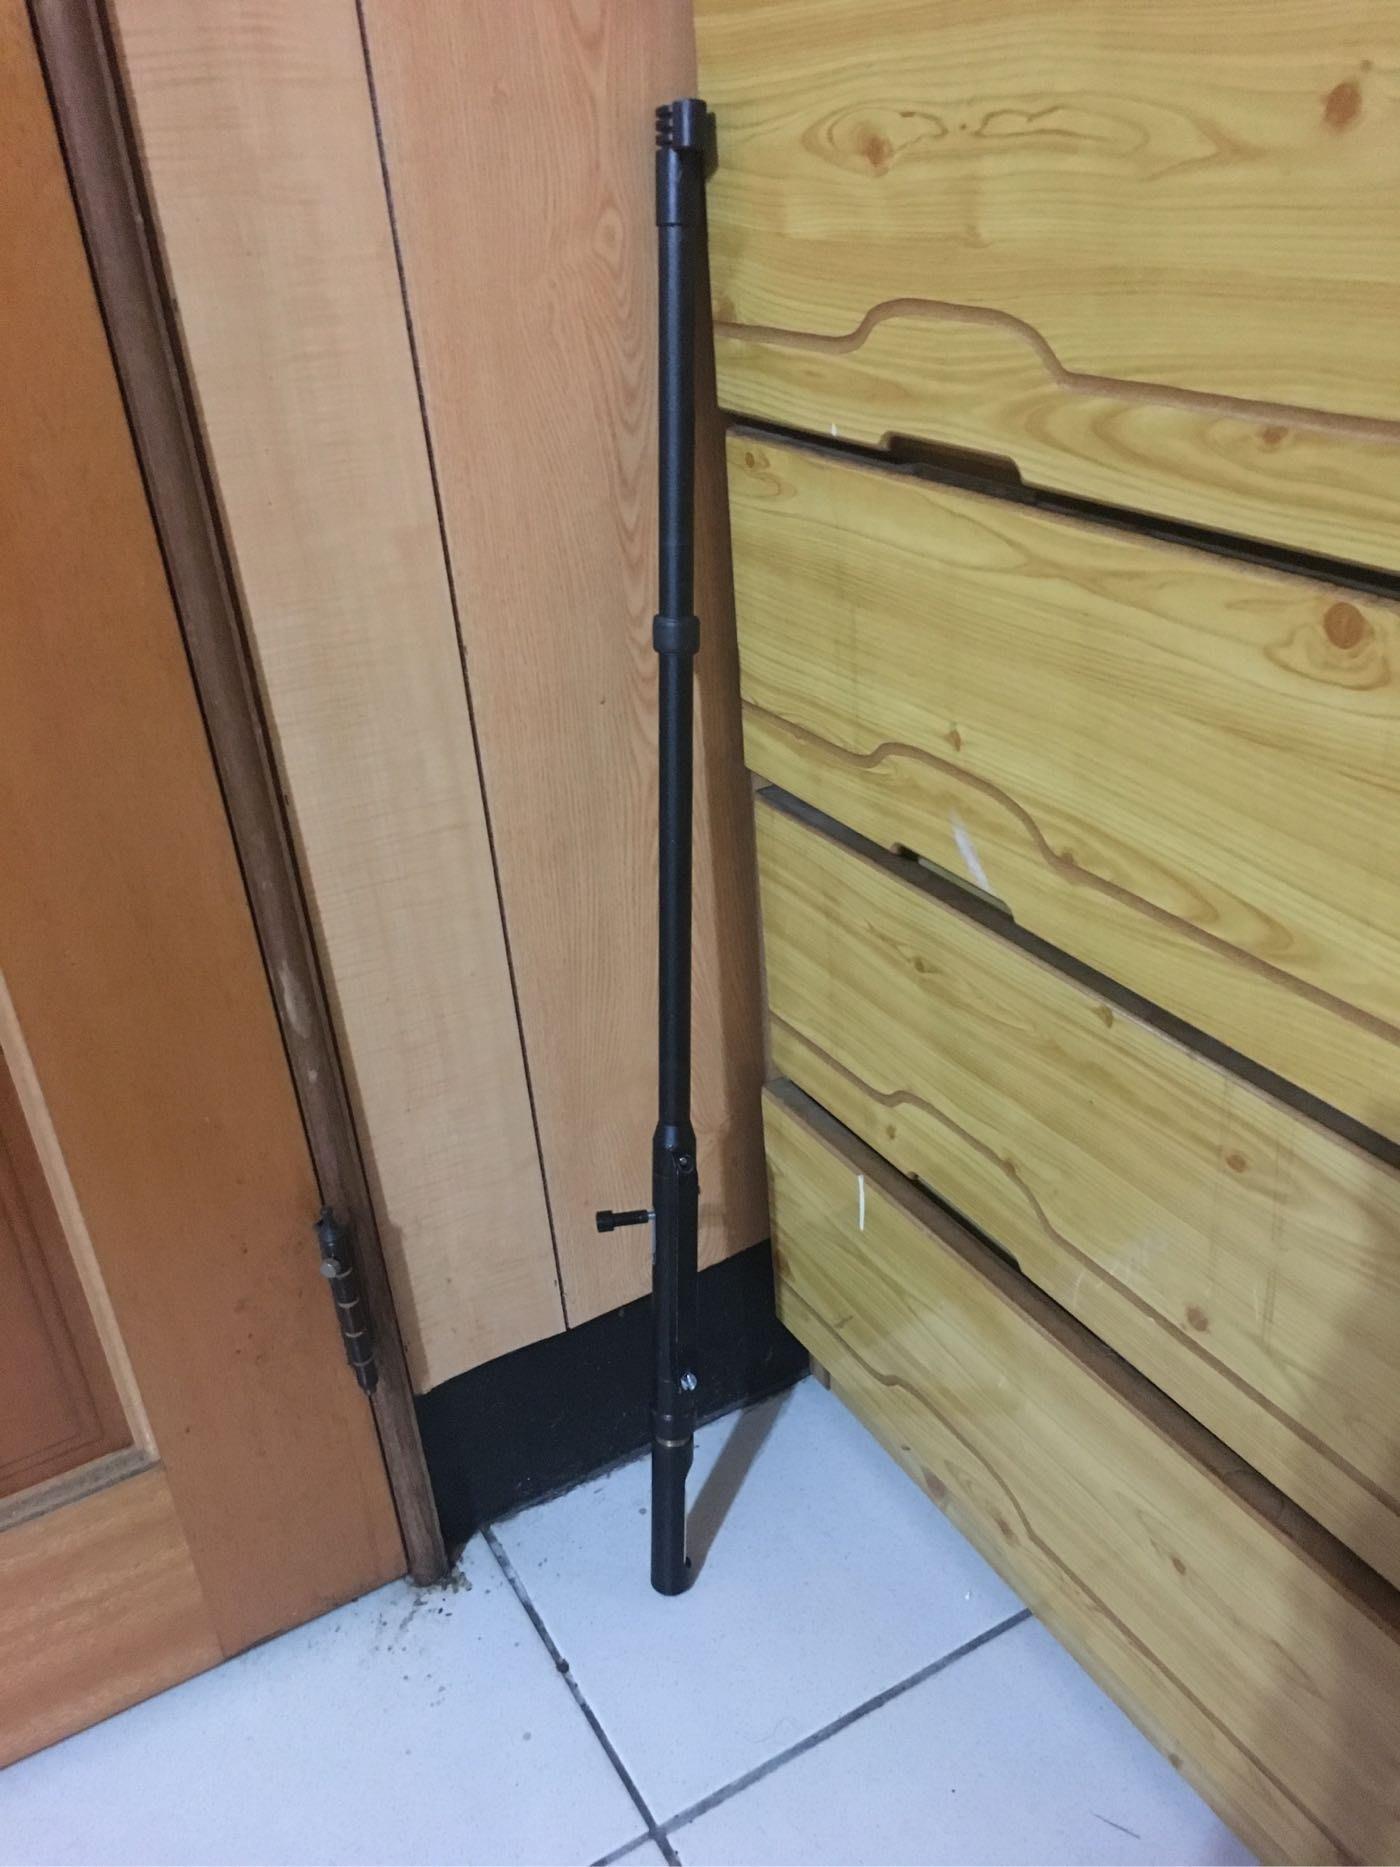 UDSP100  co2長槍(可正常擊發),缺下槍身